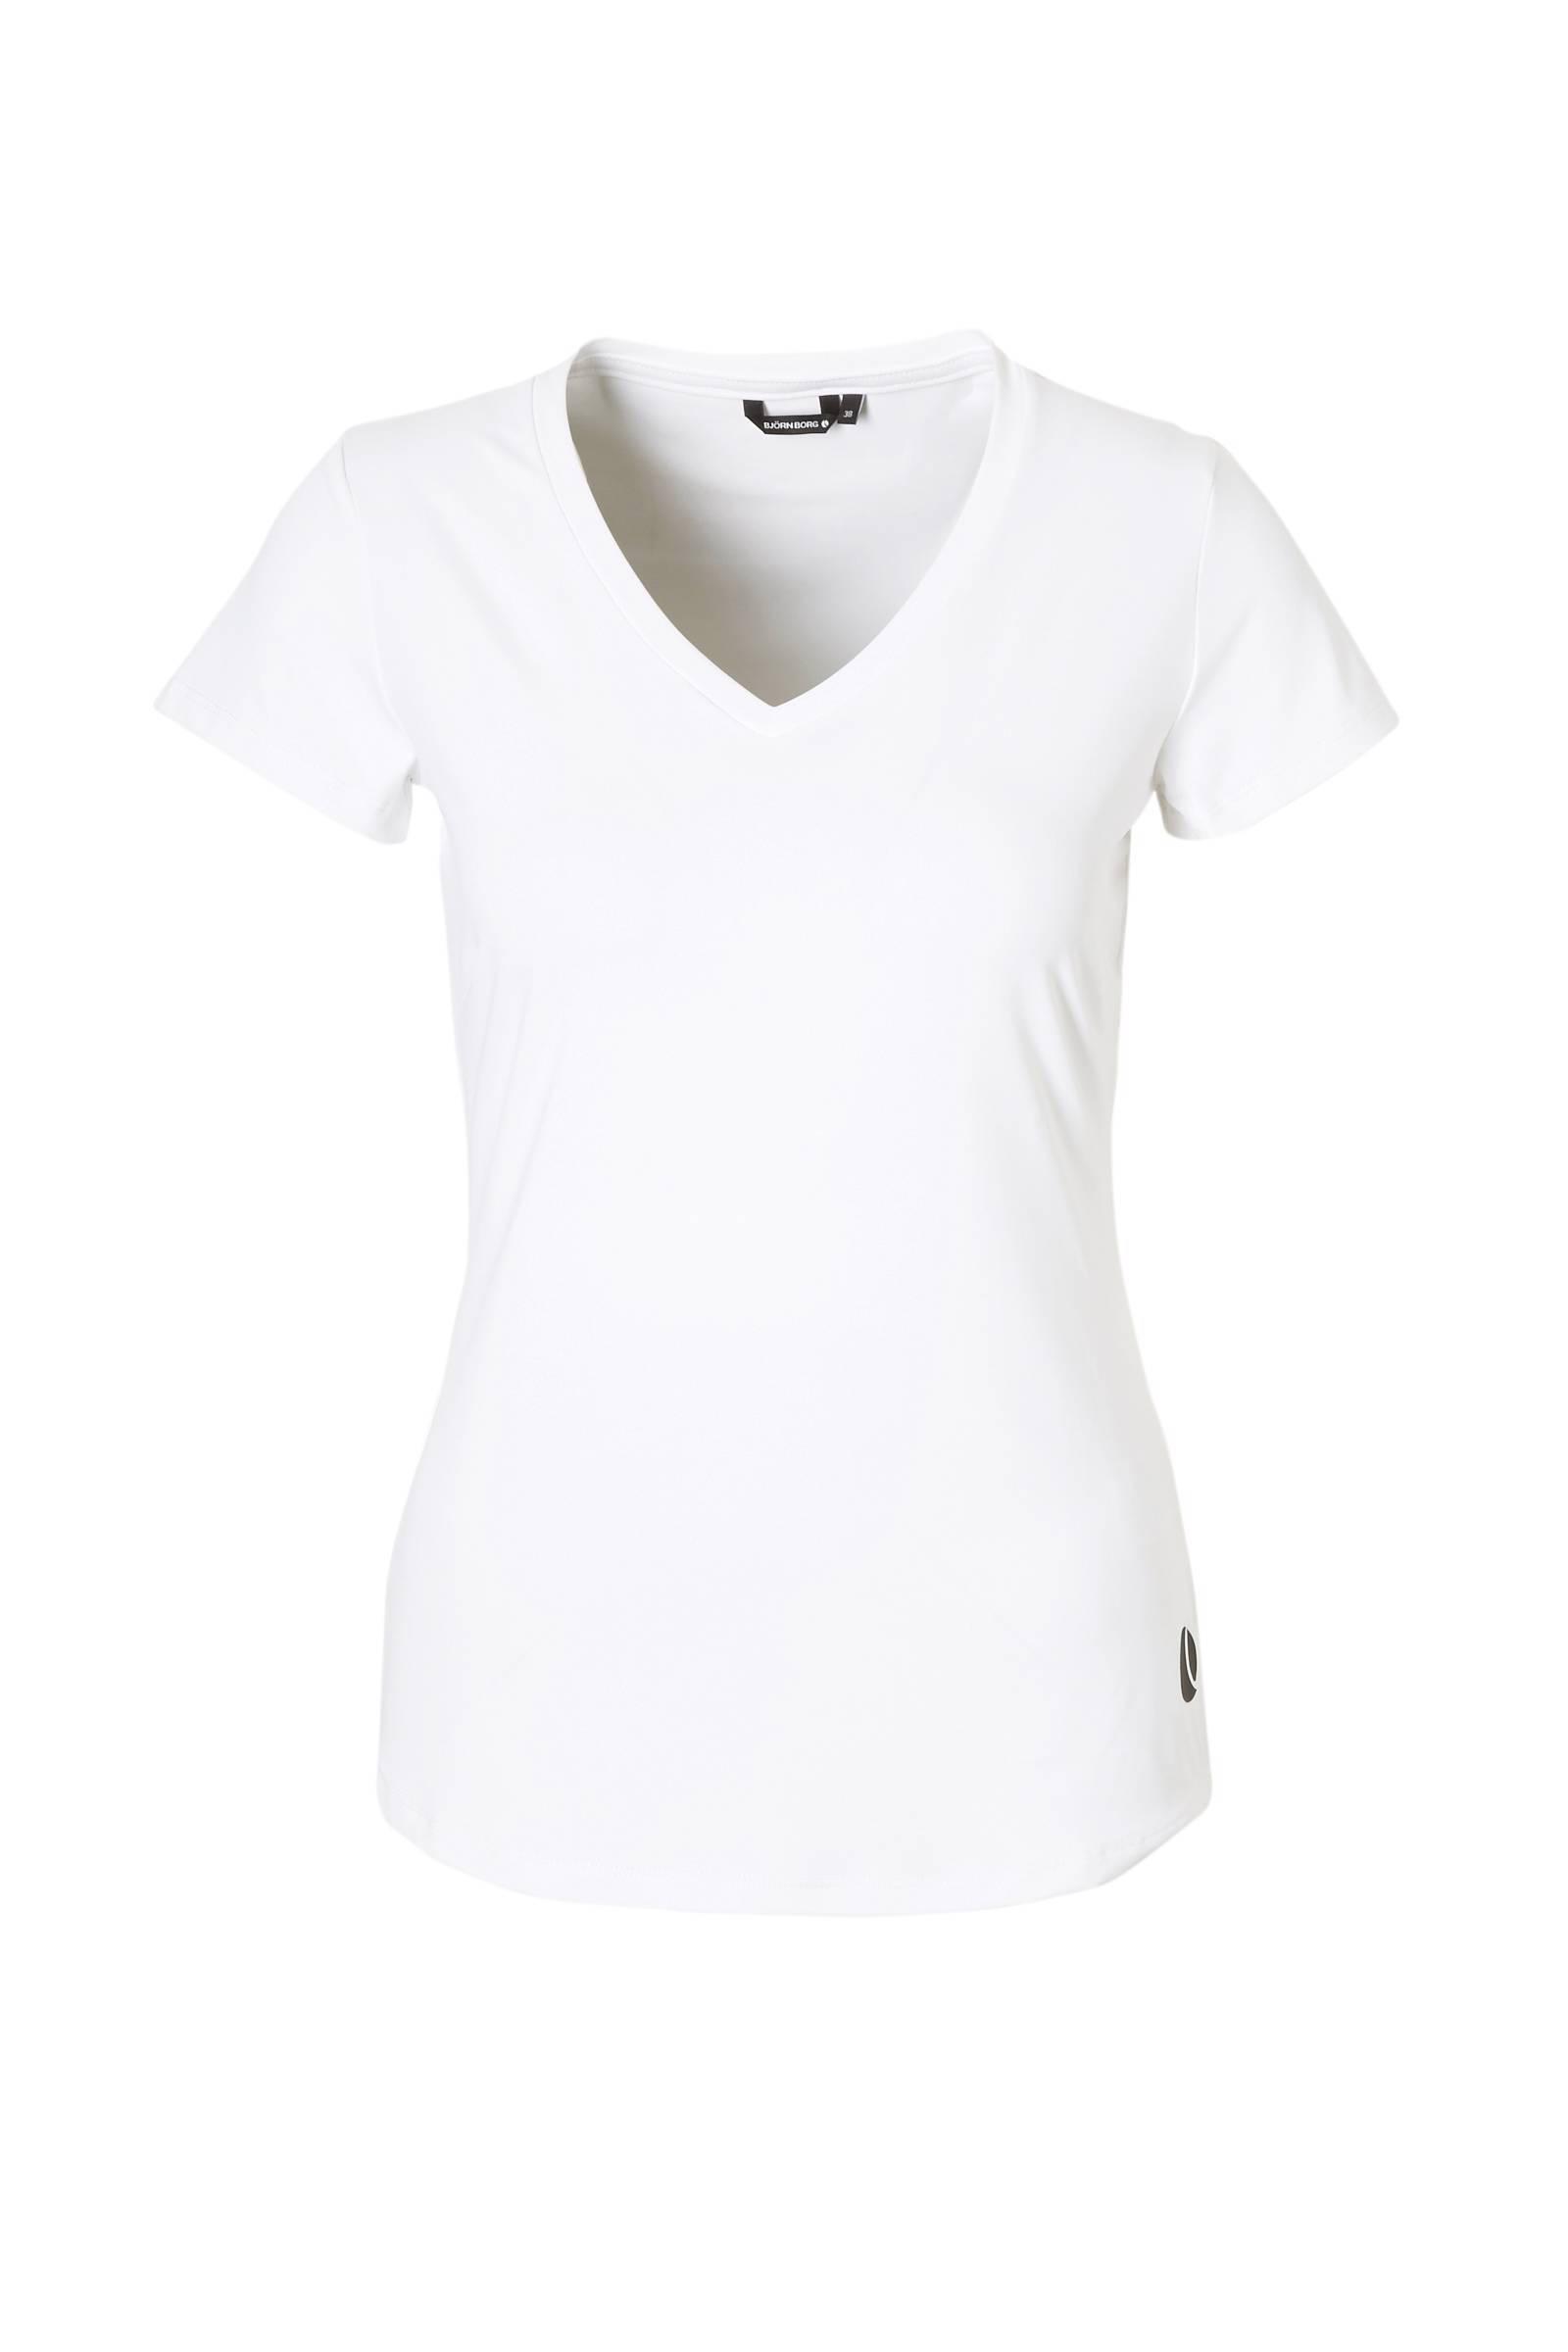 Björn Borg sport T-shirt